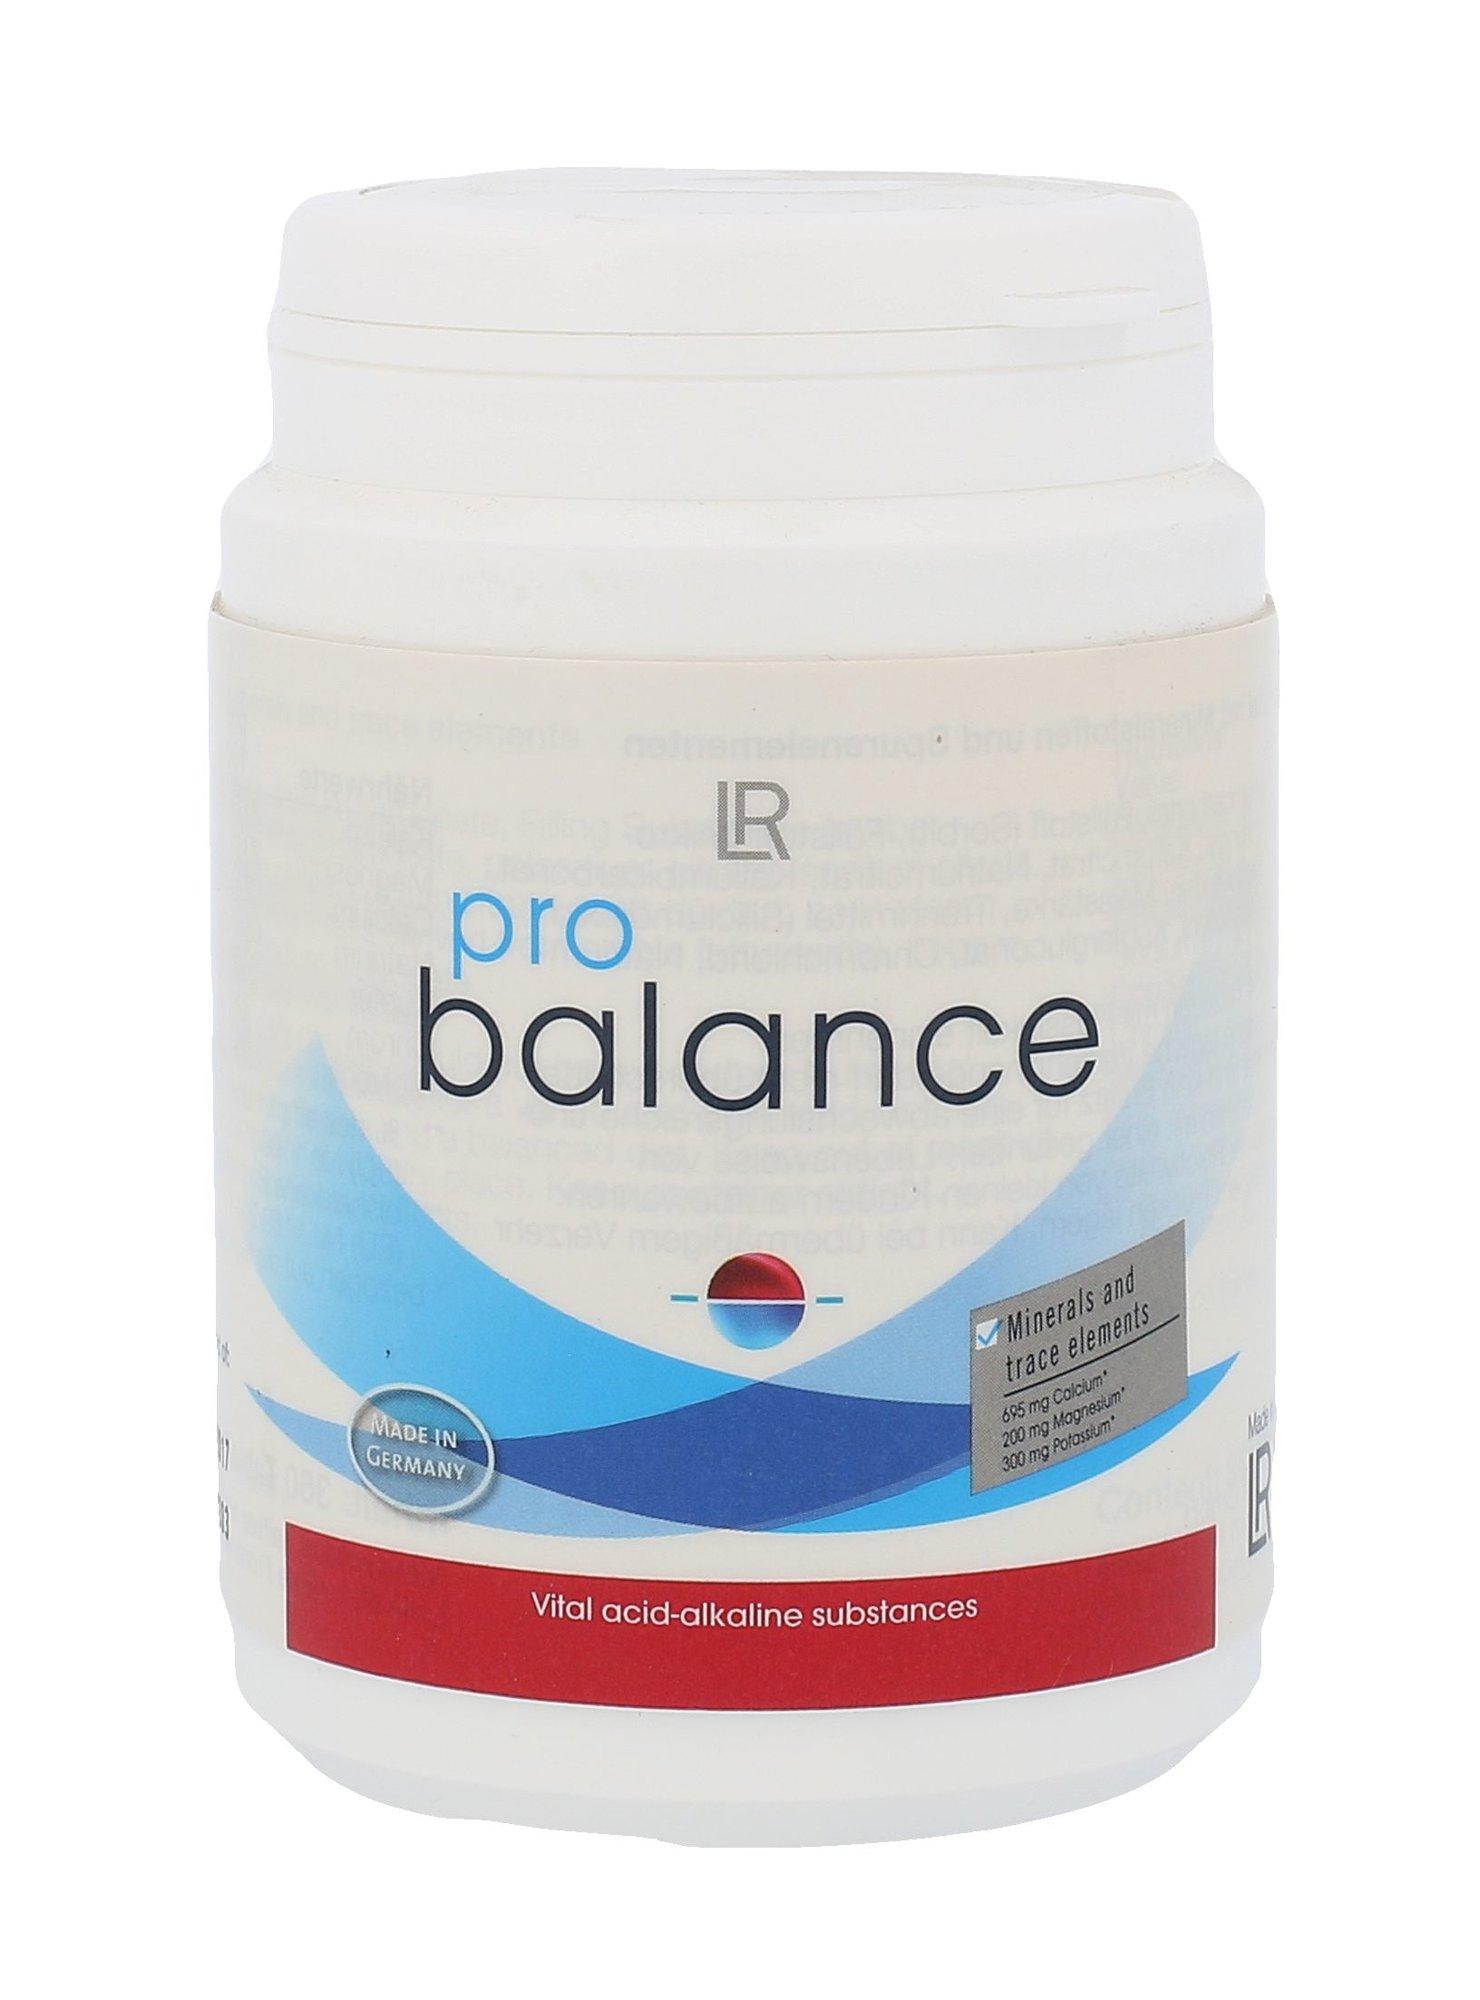 LR Pro Balance Cosmetic 252ml